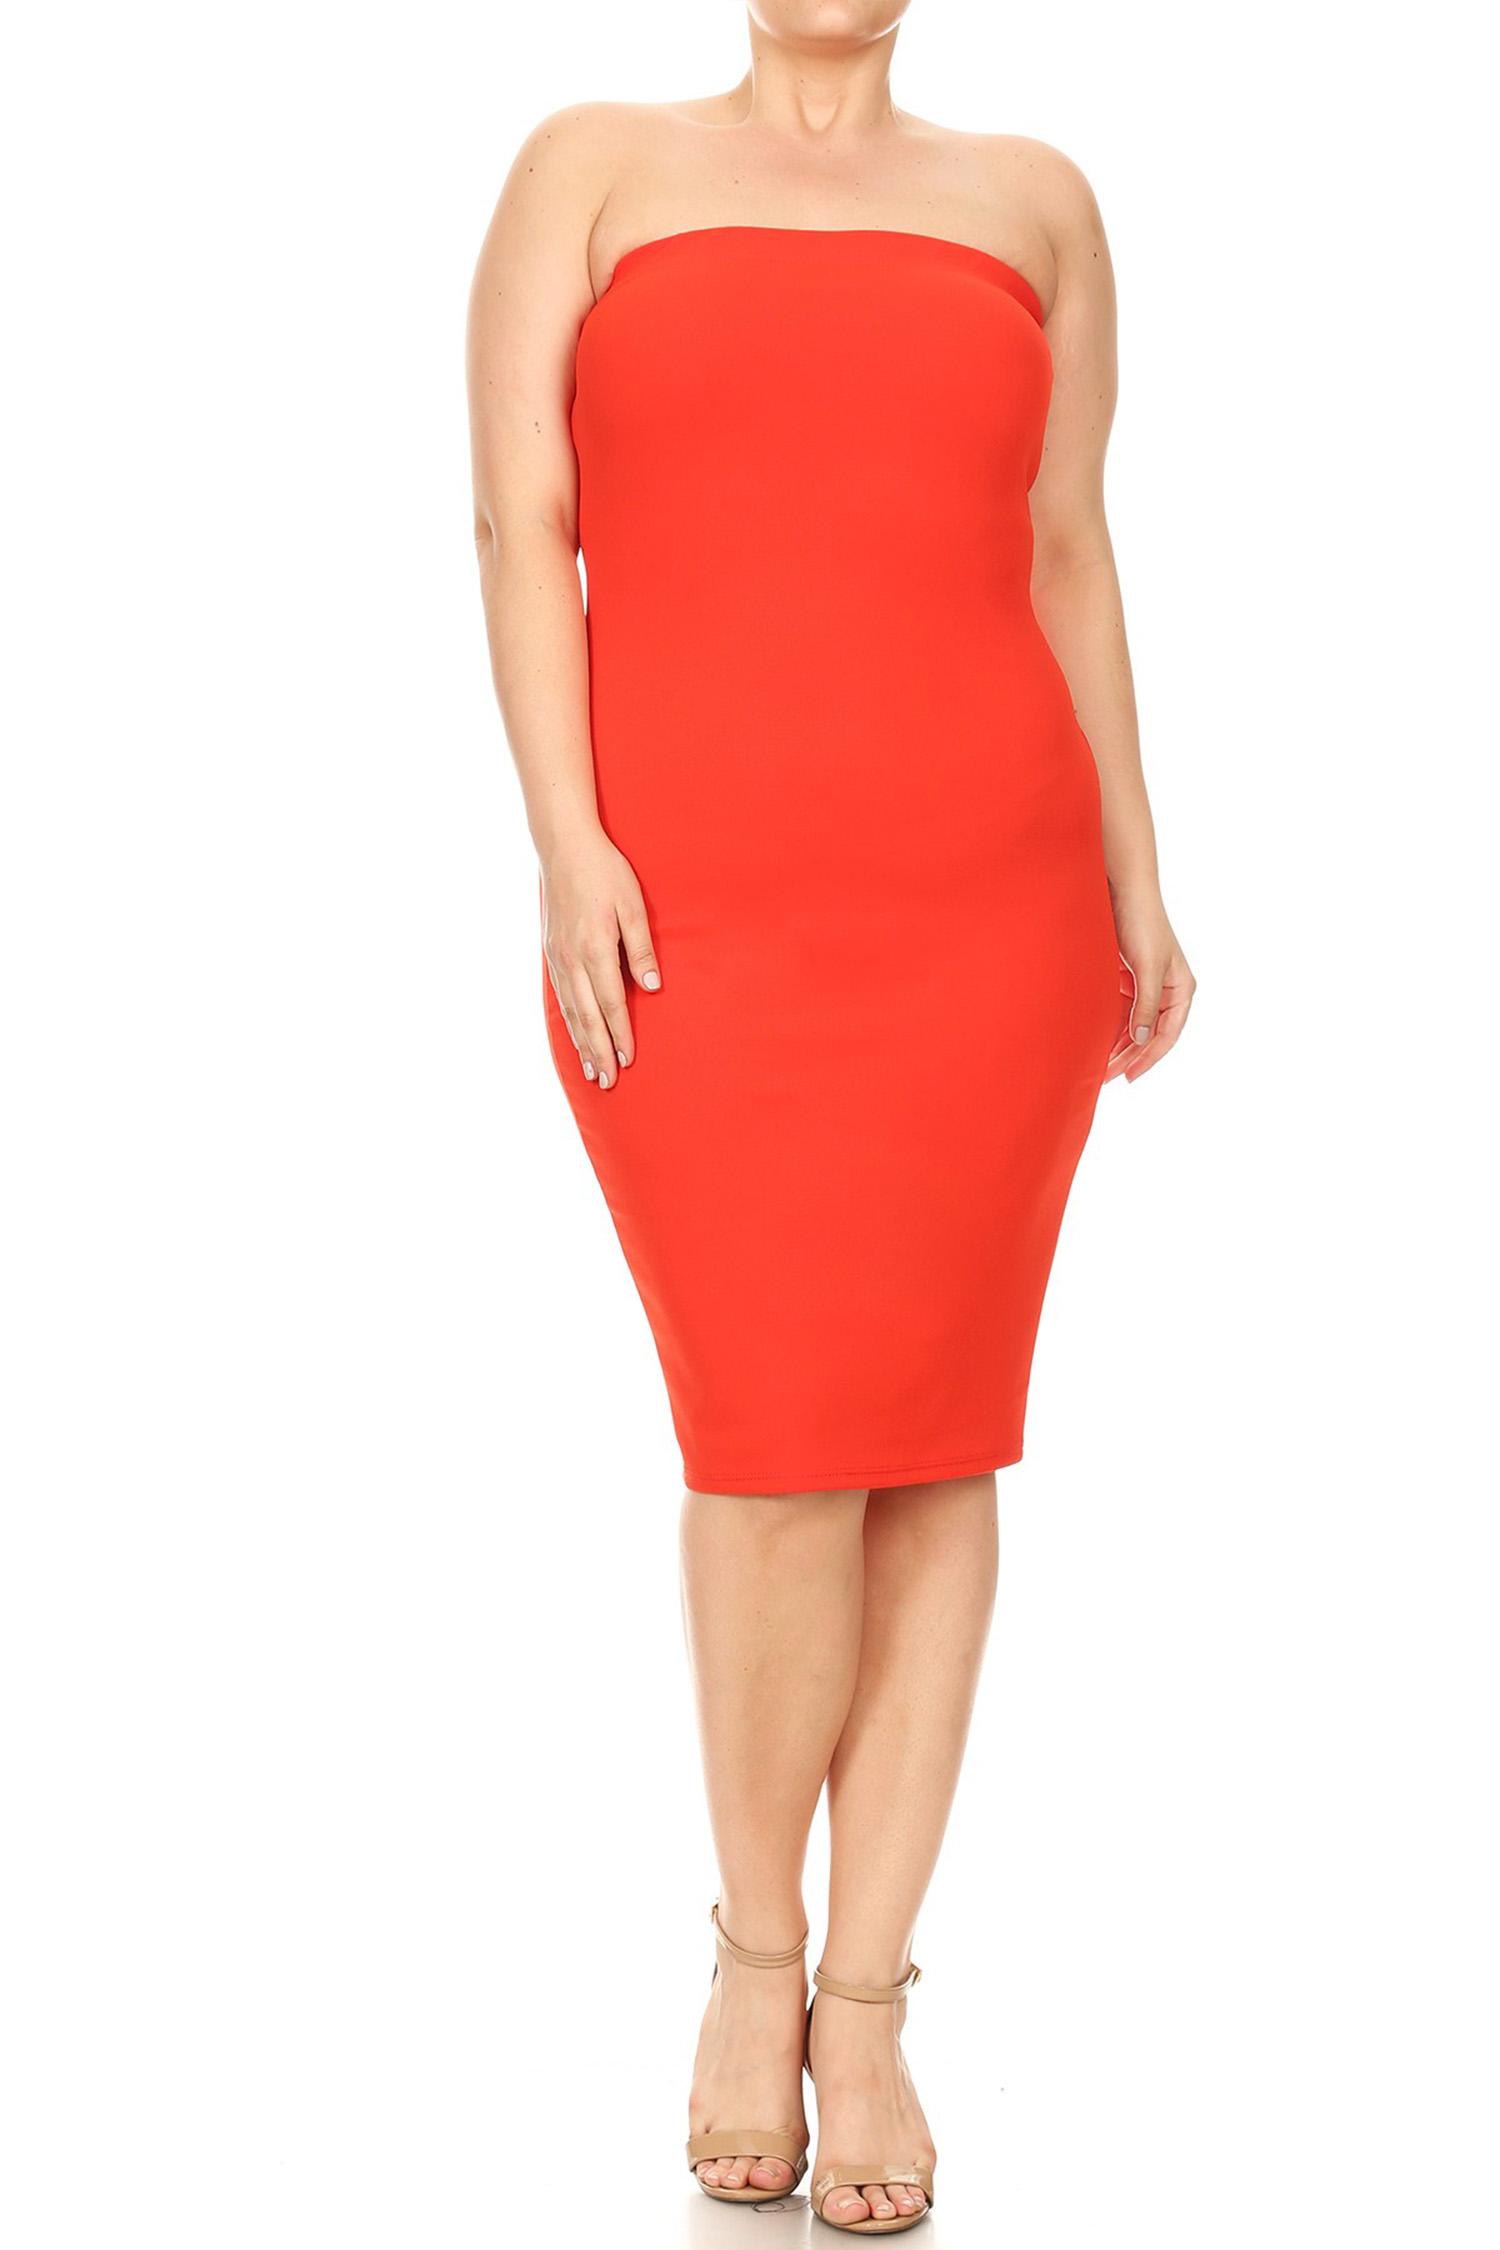 Women's Plus Size Solid Bodycon Dress